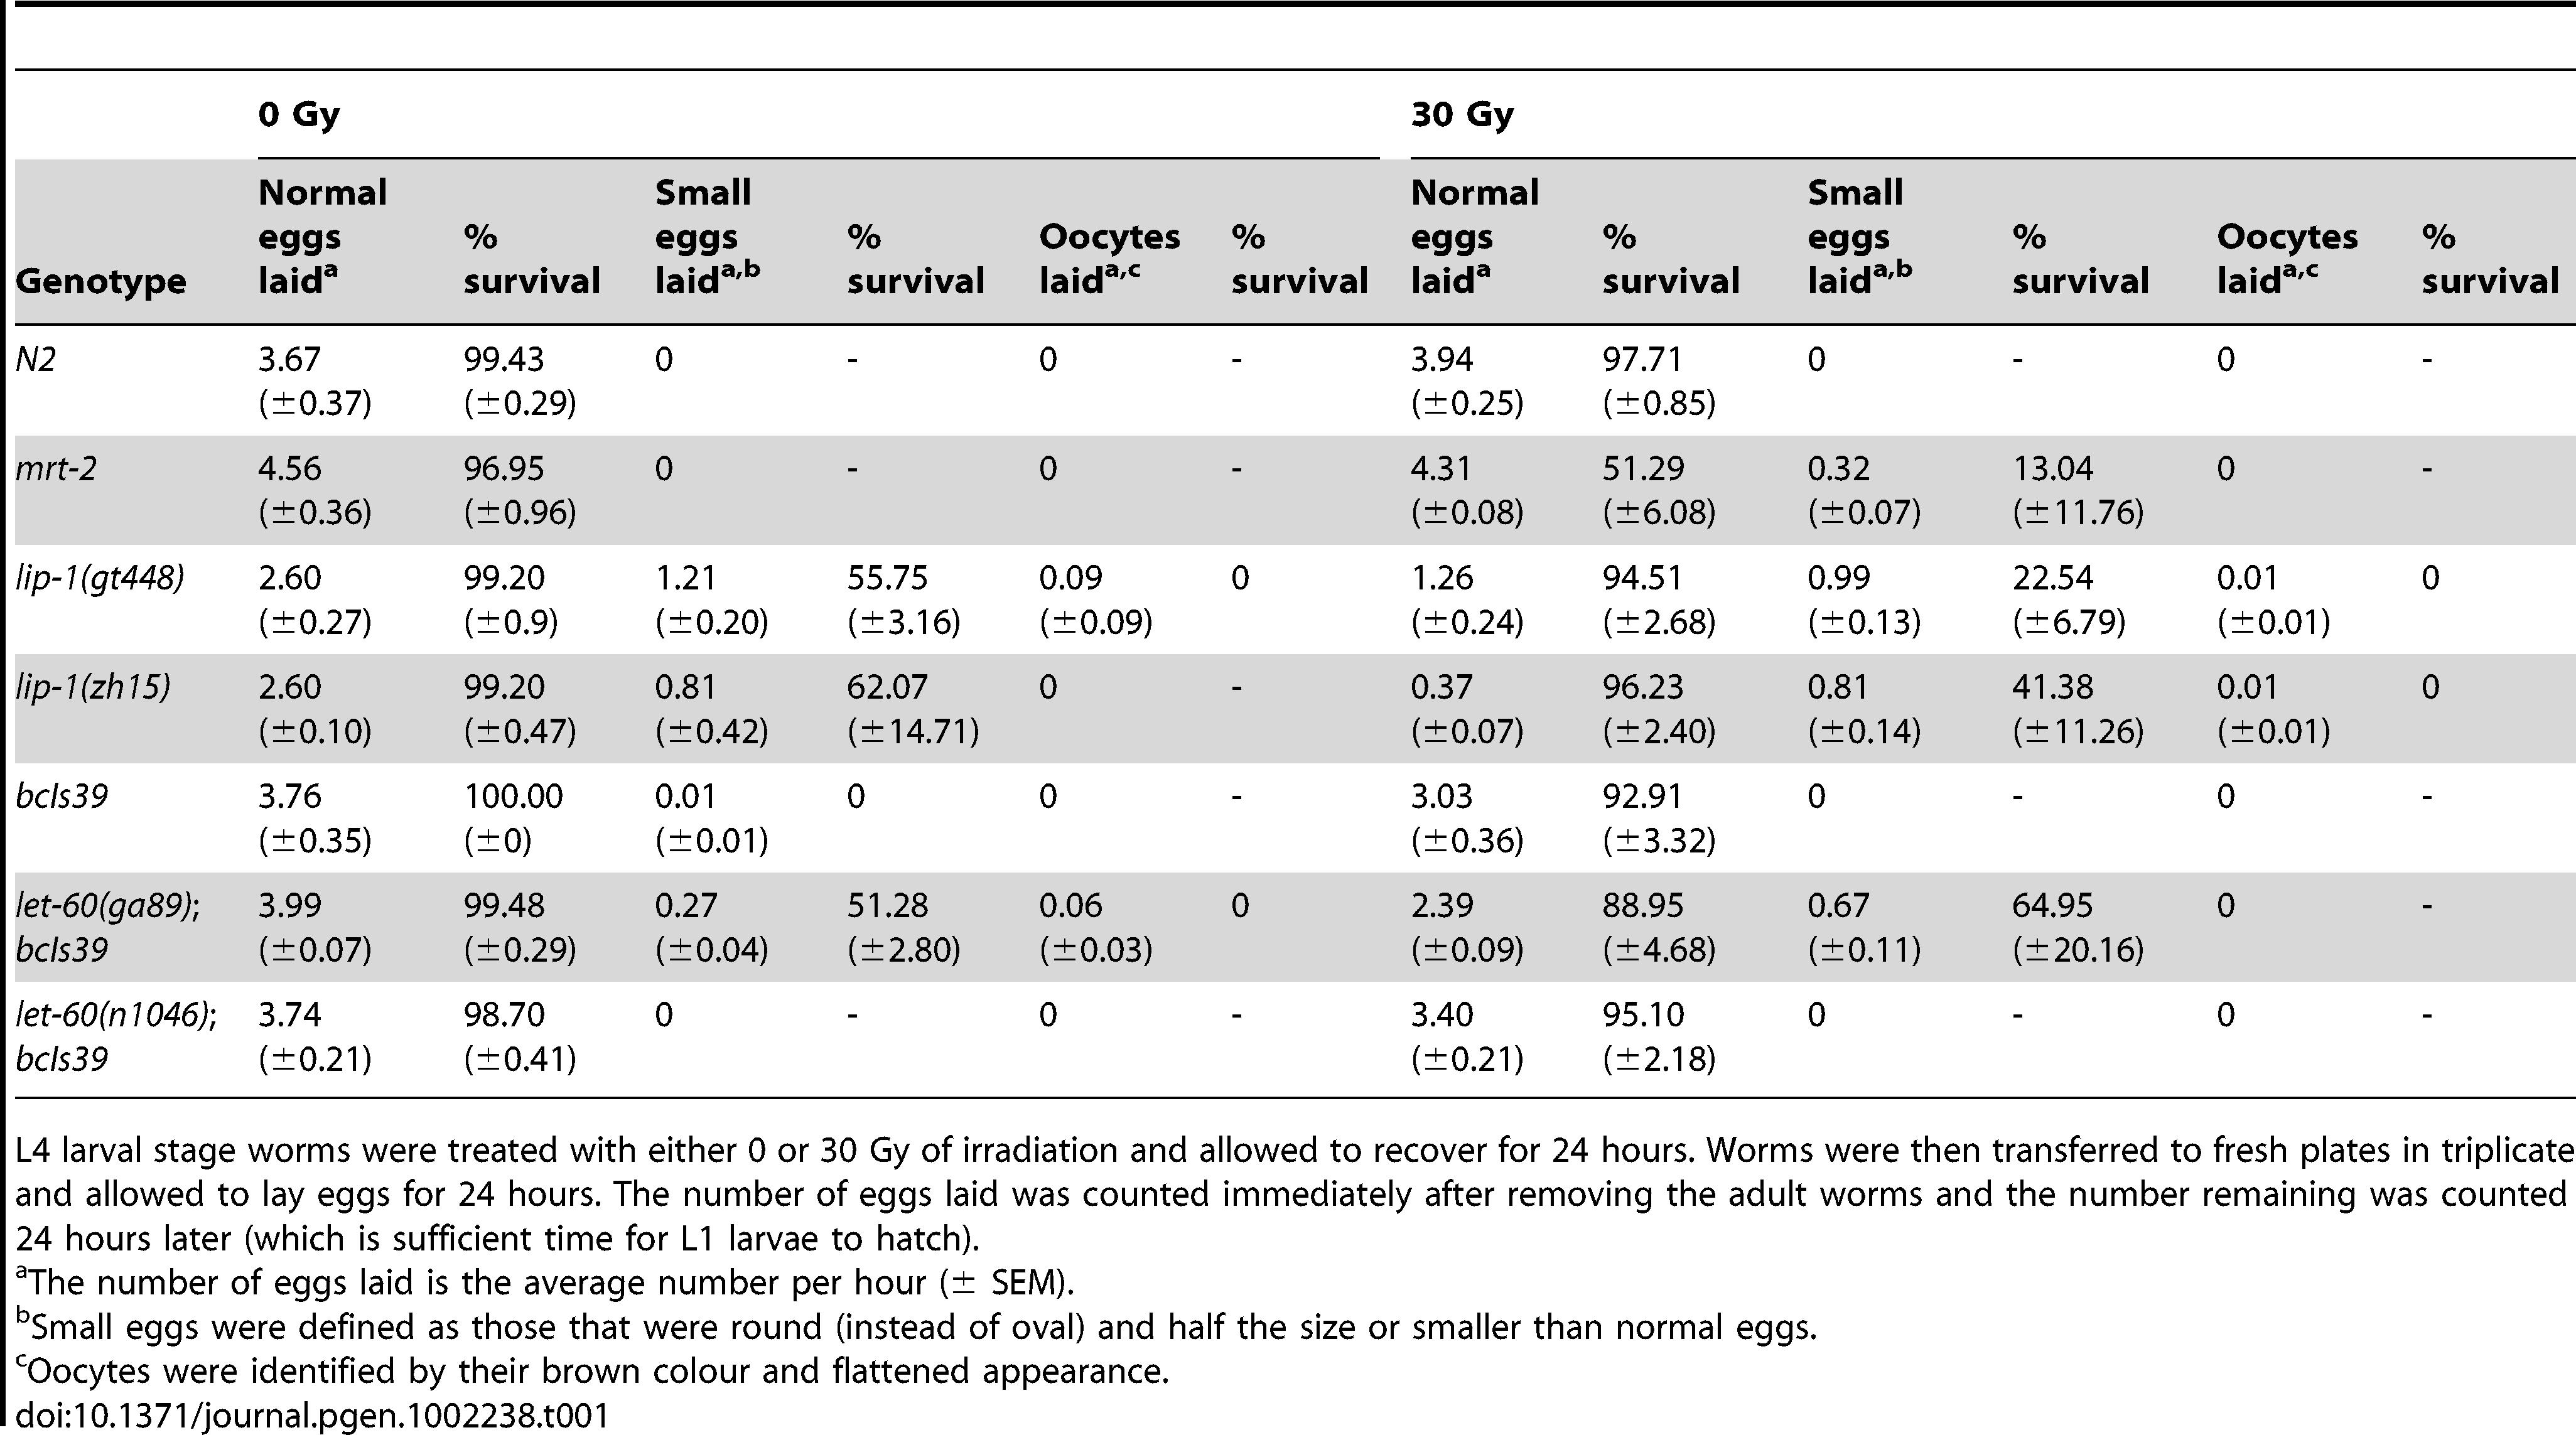 <i>lip-1(lf)</i> and <i>let-60(gf)</i> mutants do not show radiation sensitivity.